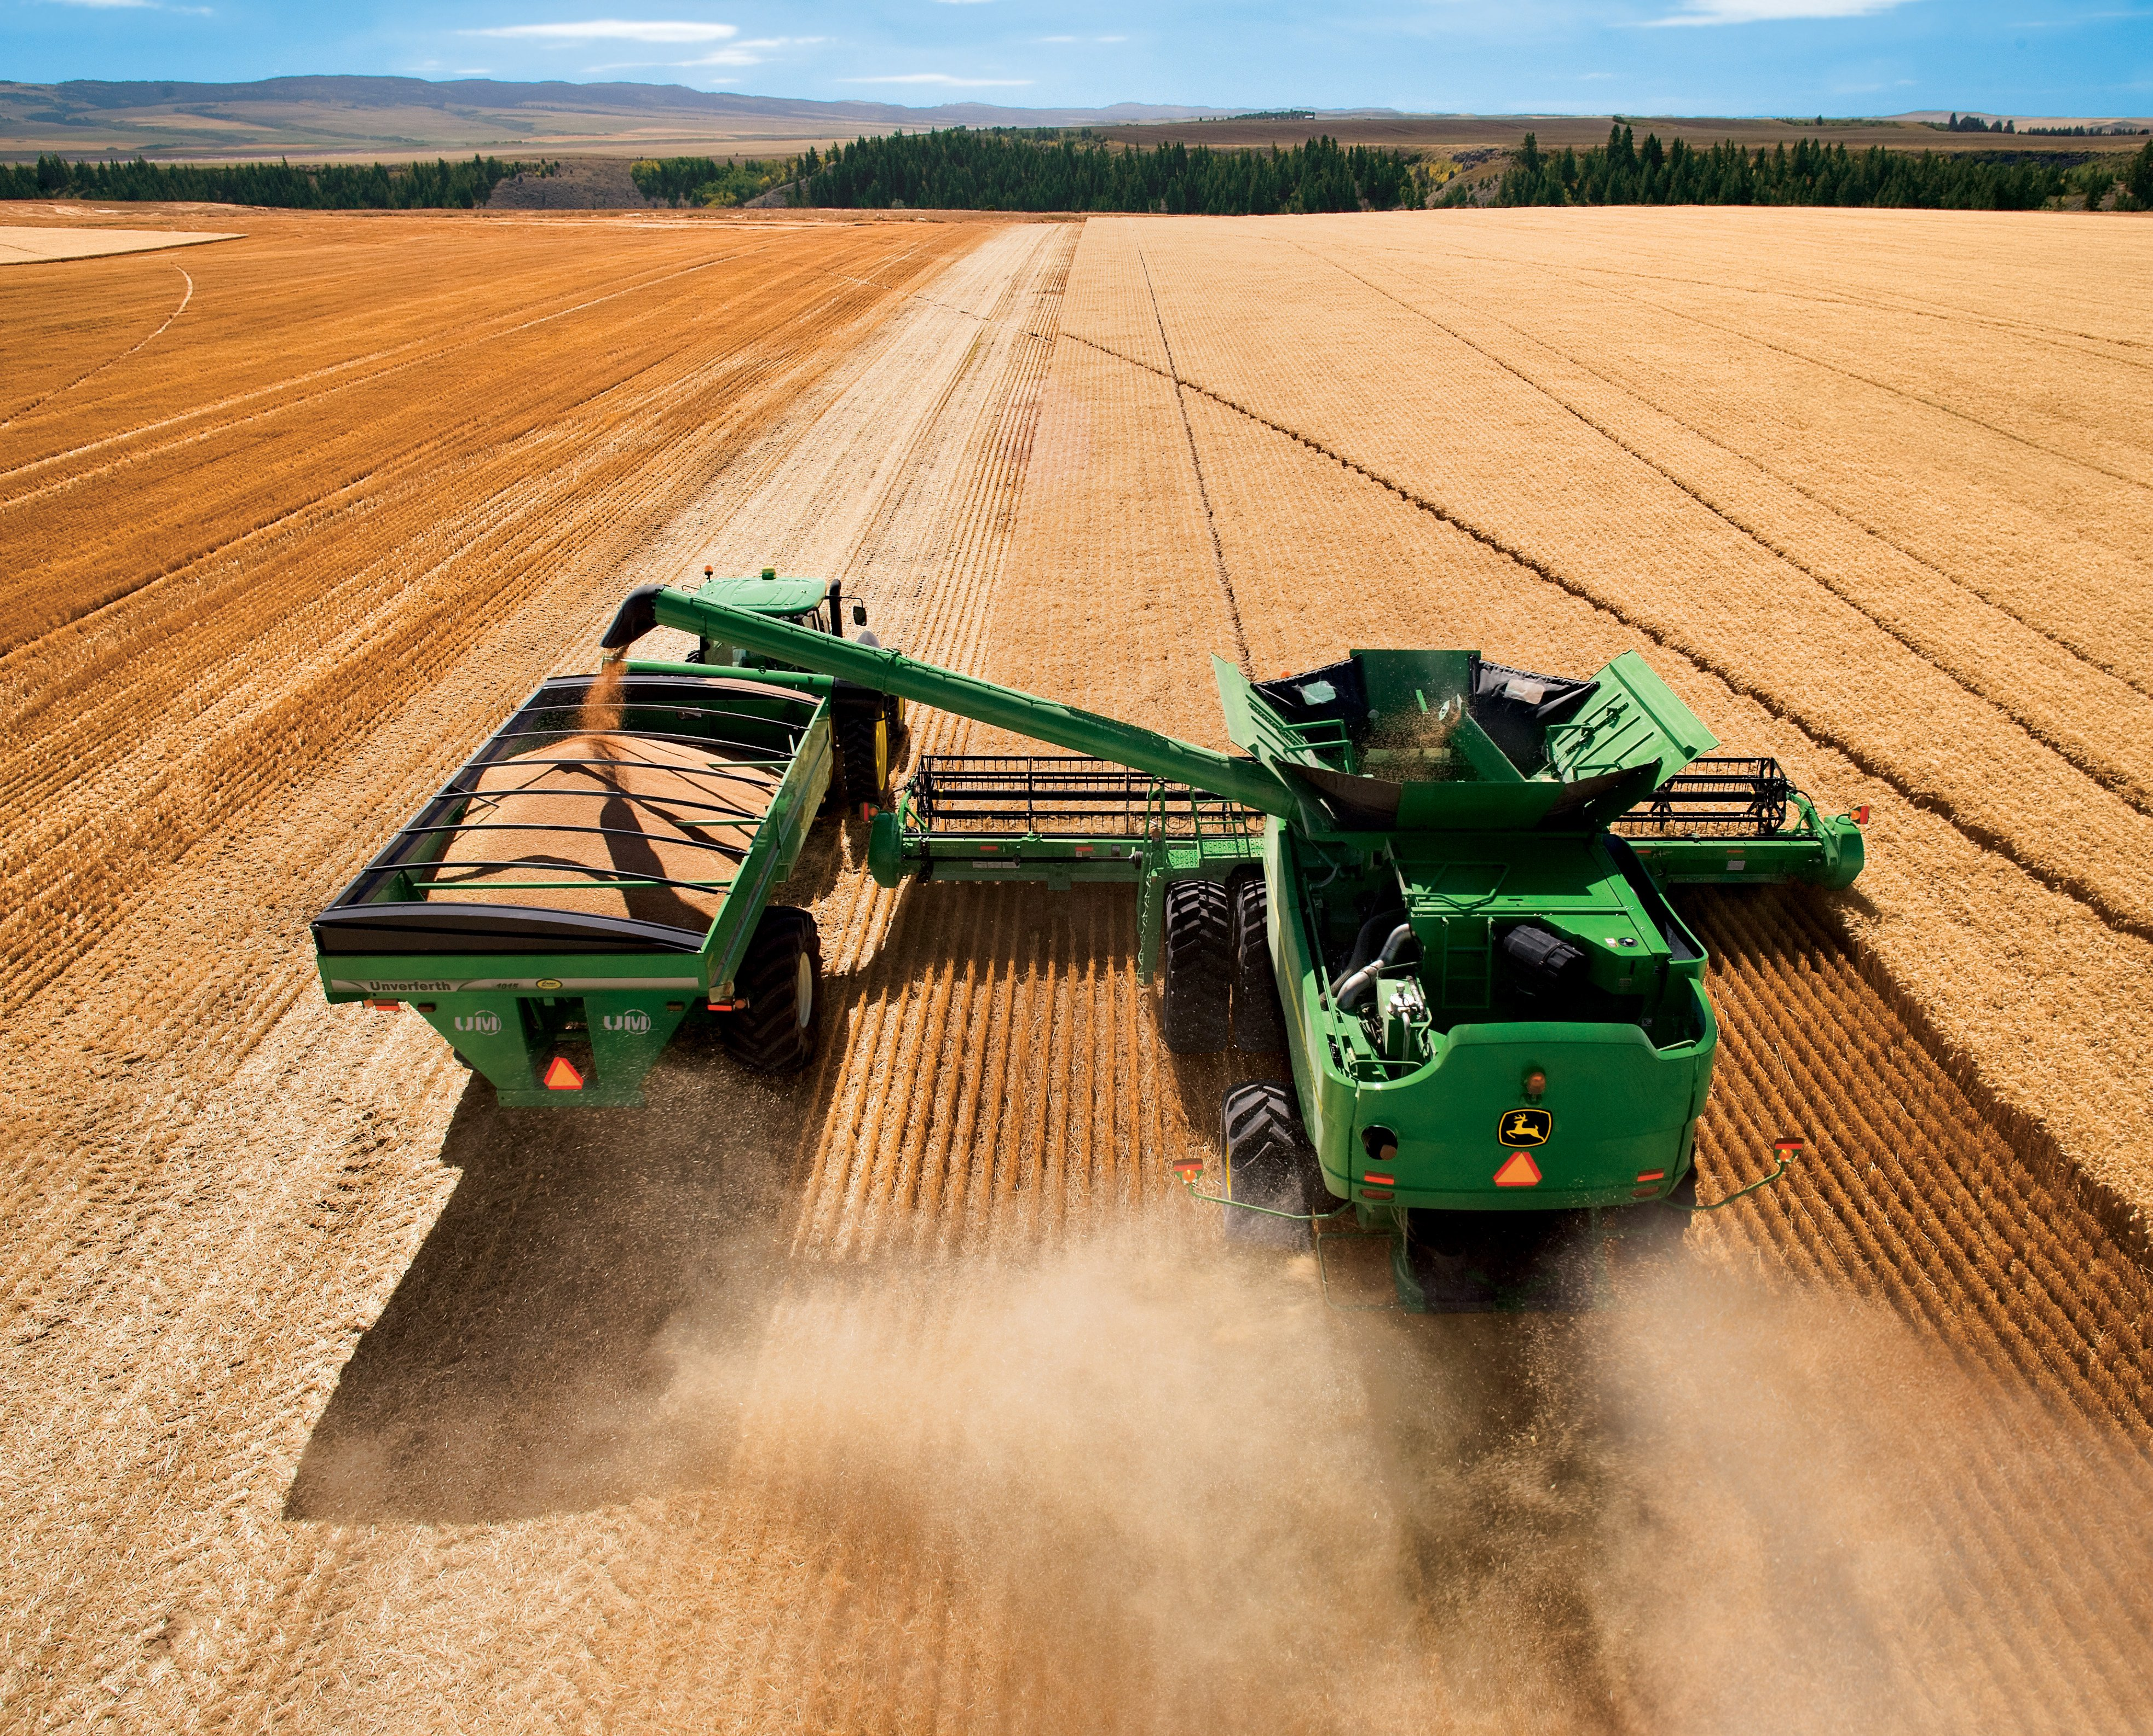 john Deere Tractor Farm Industrial Farming 1jdeere 3933x3171